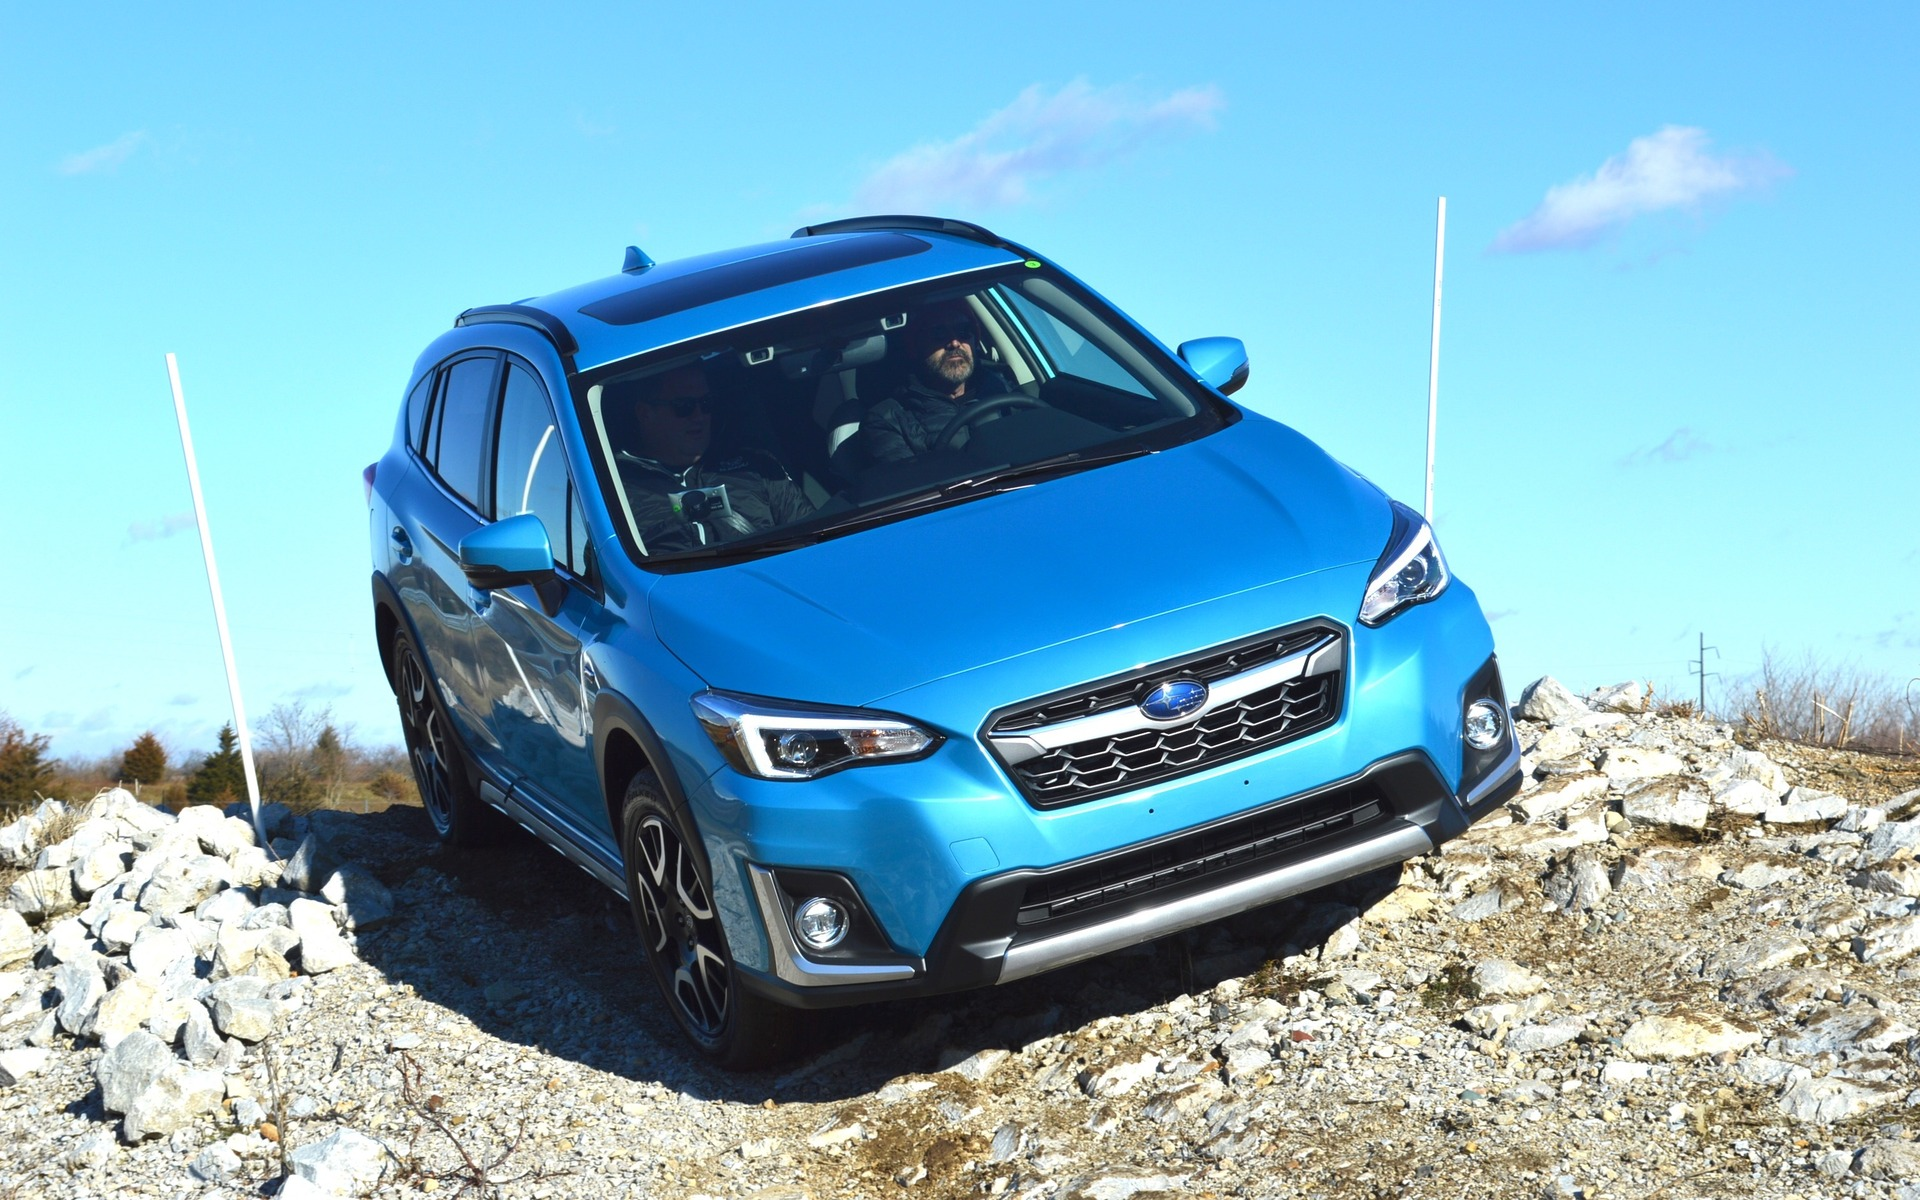 2020 Subaru Crosstrek Phev In Need Of Longer Range The Car Guide